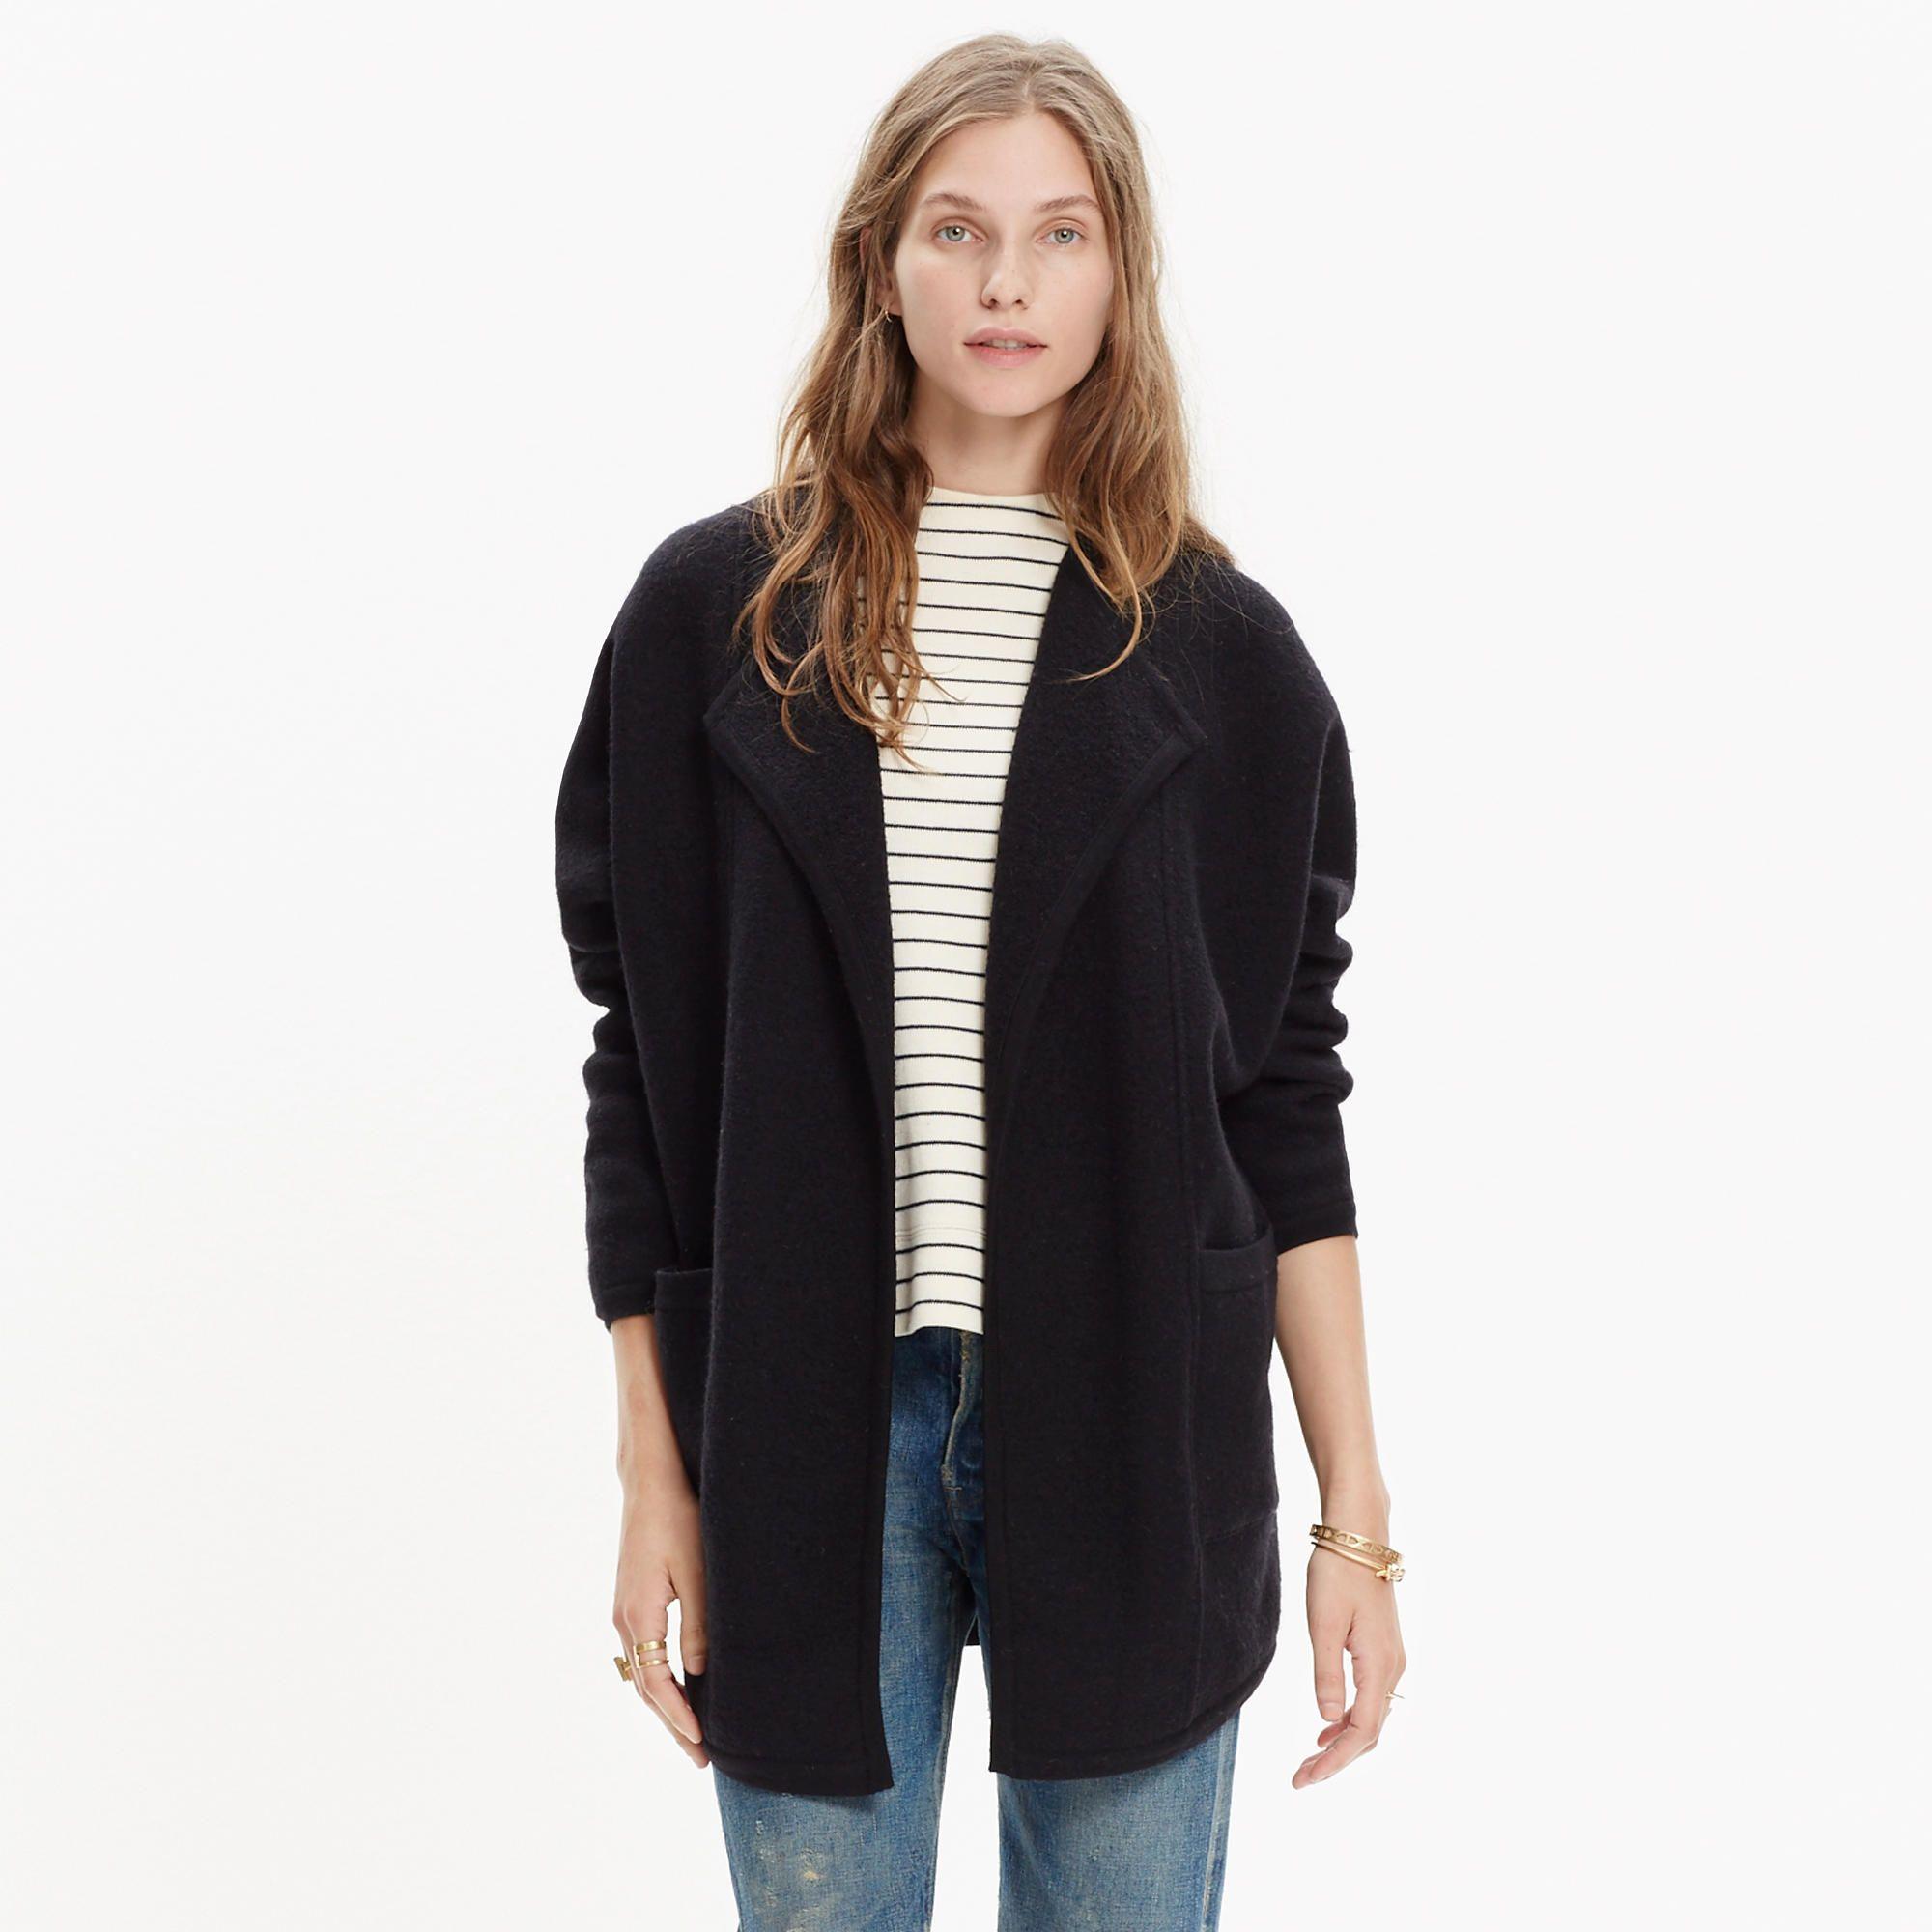 Oversized Sweater-Jacket : jackets | Madewell | Fall Fashion ...